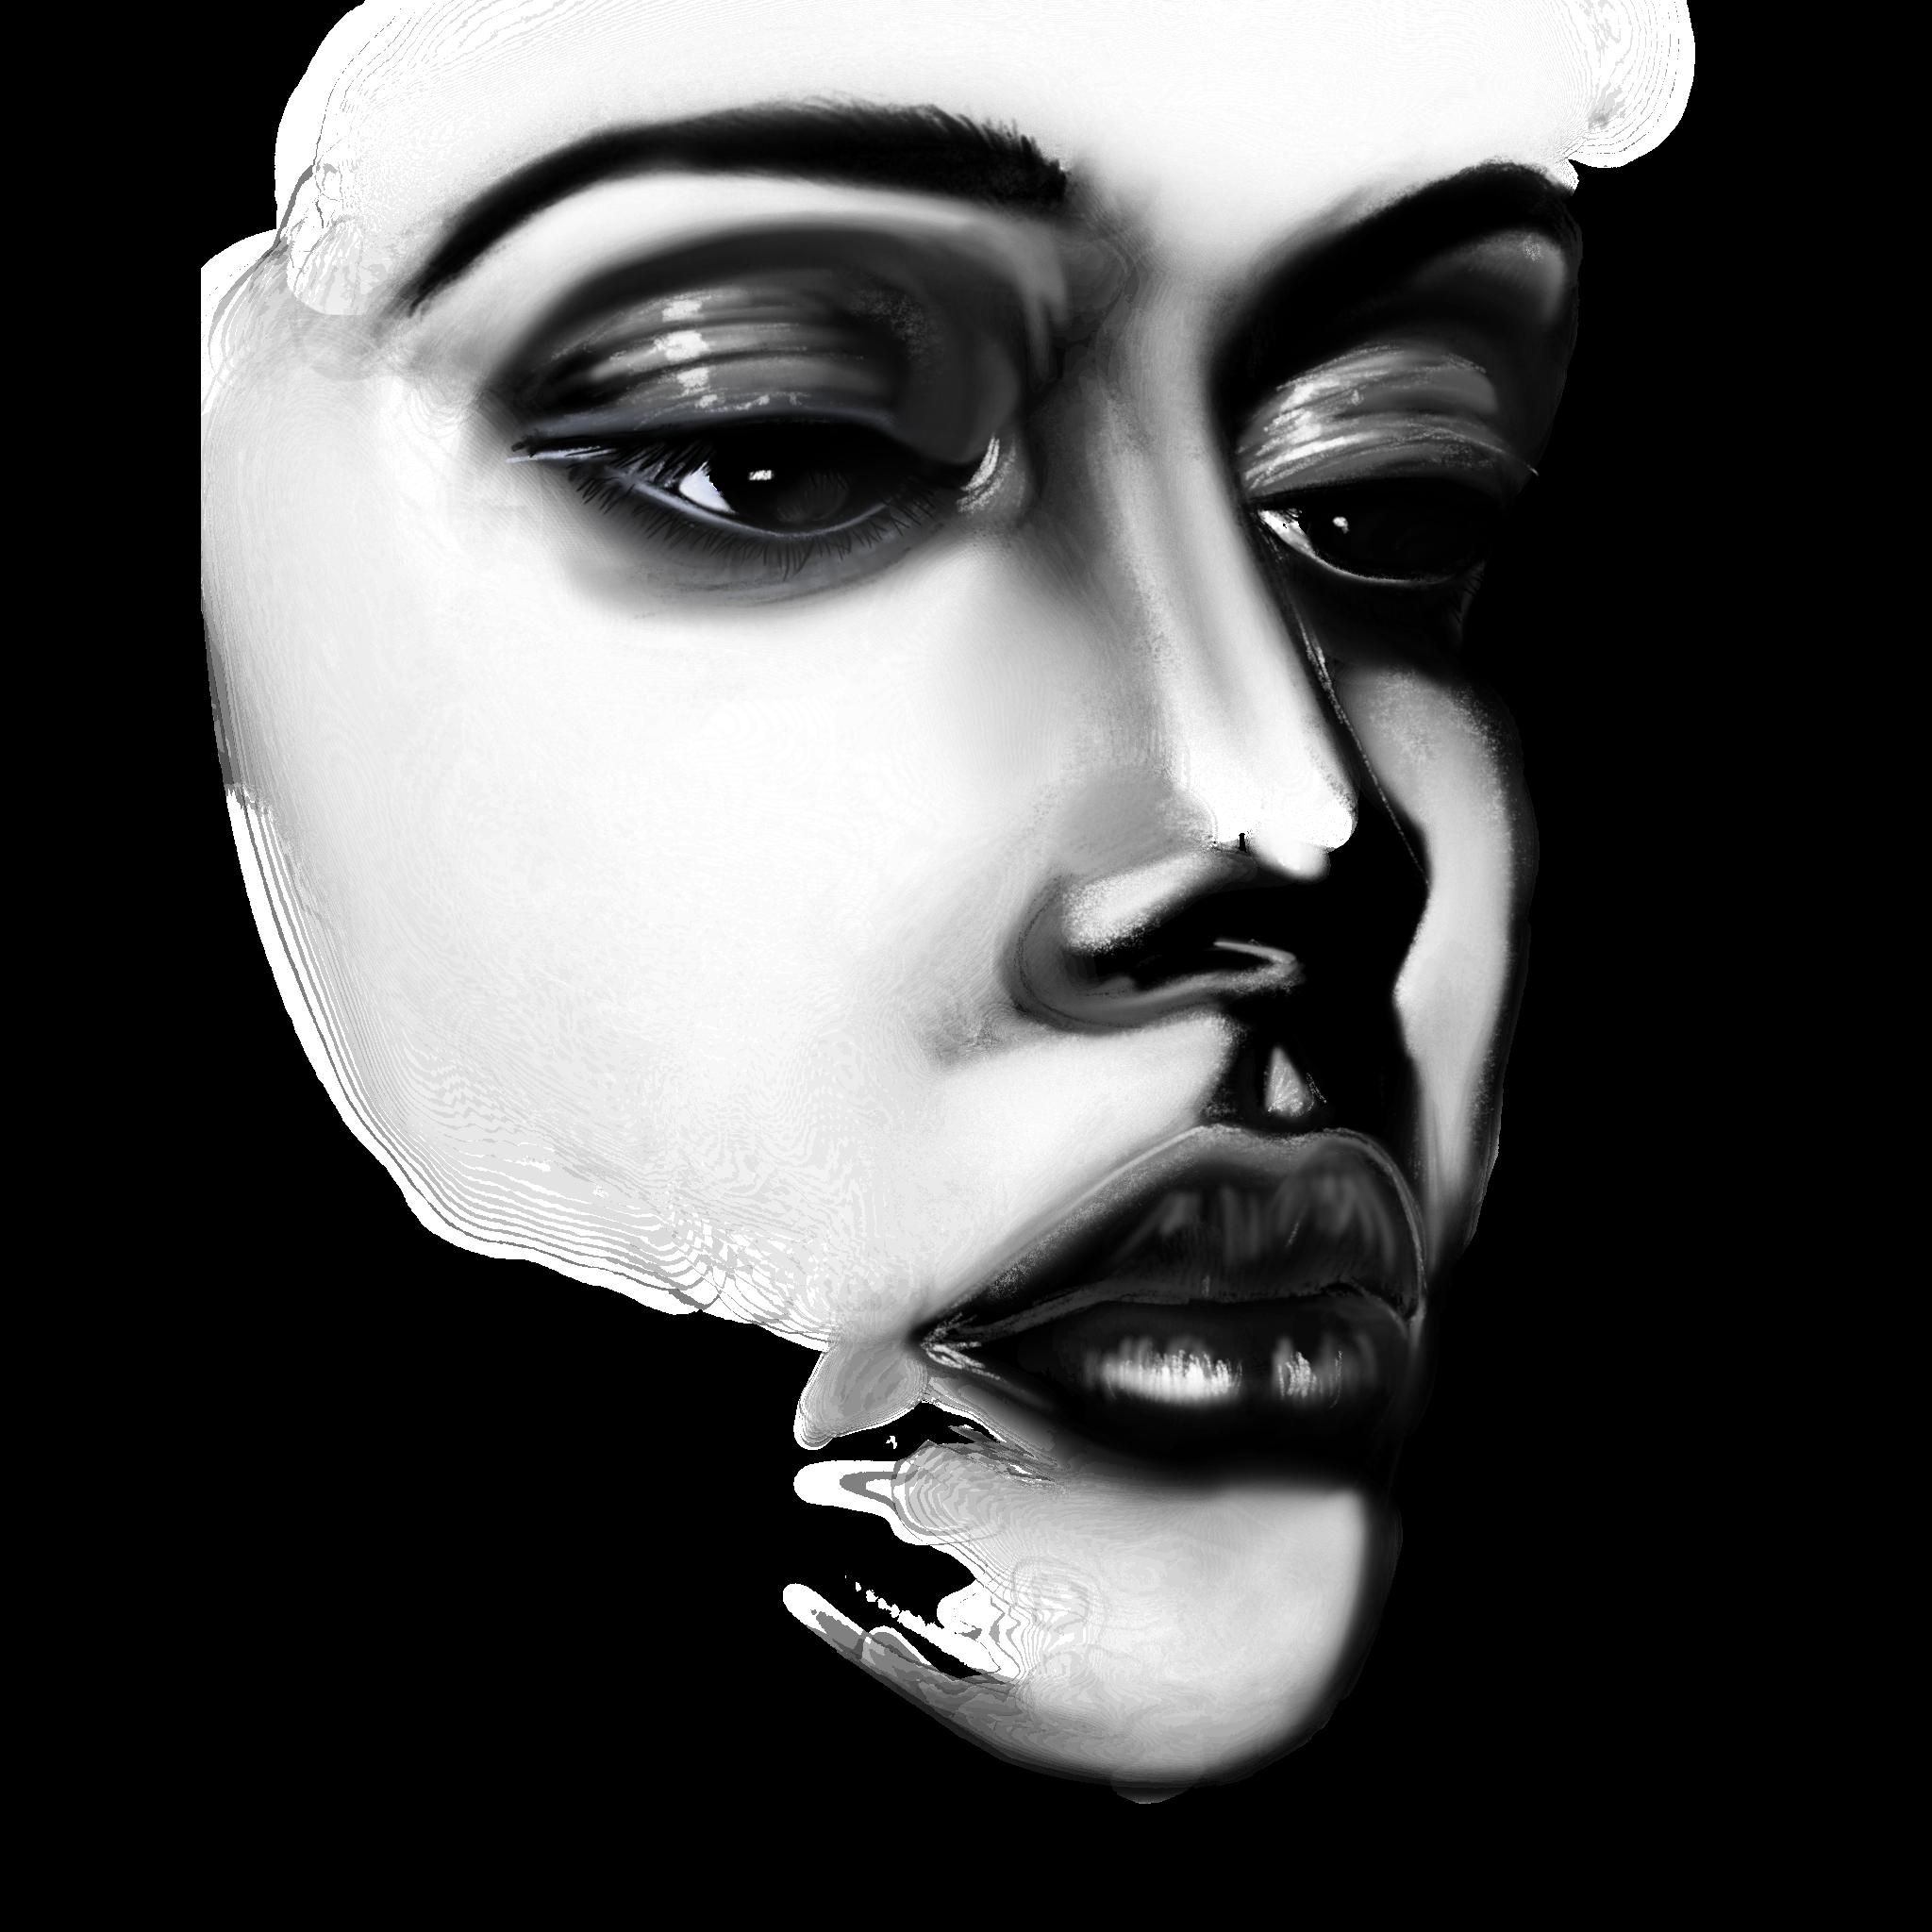 Art Sketch Girl Face Drawing Free Image